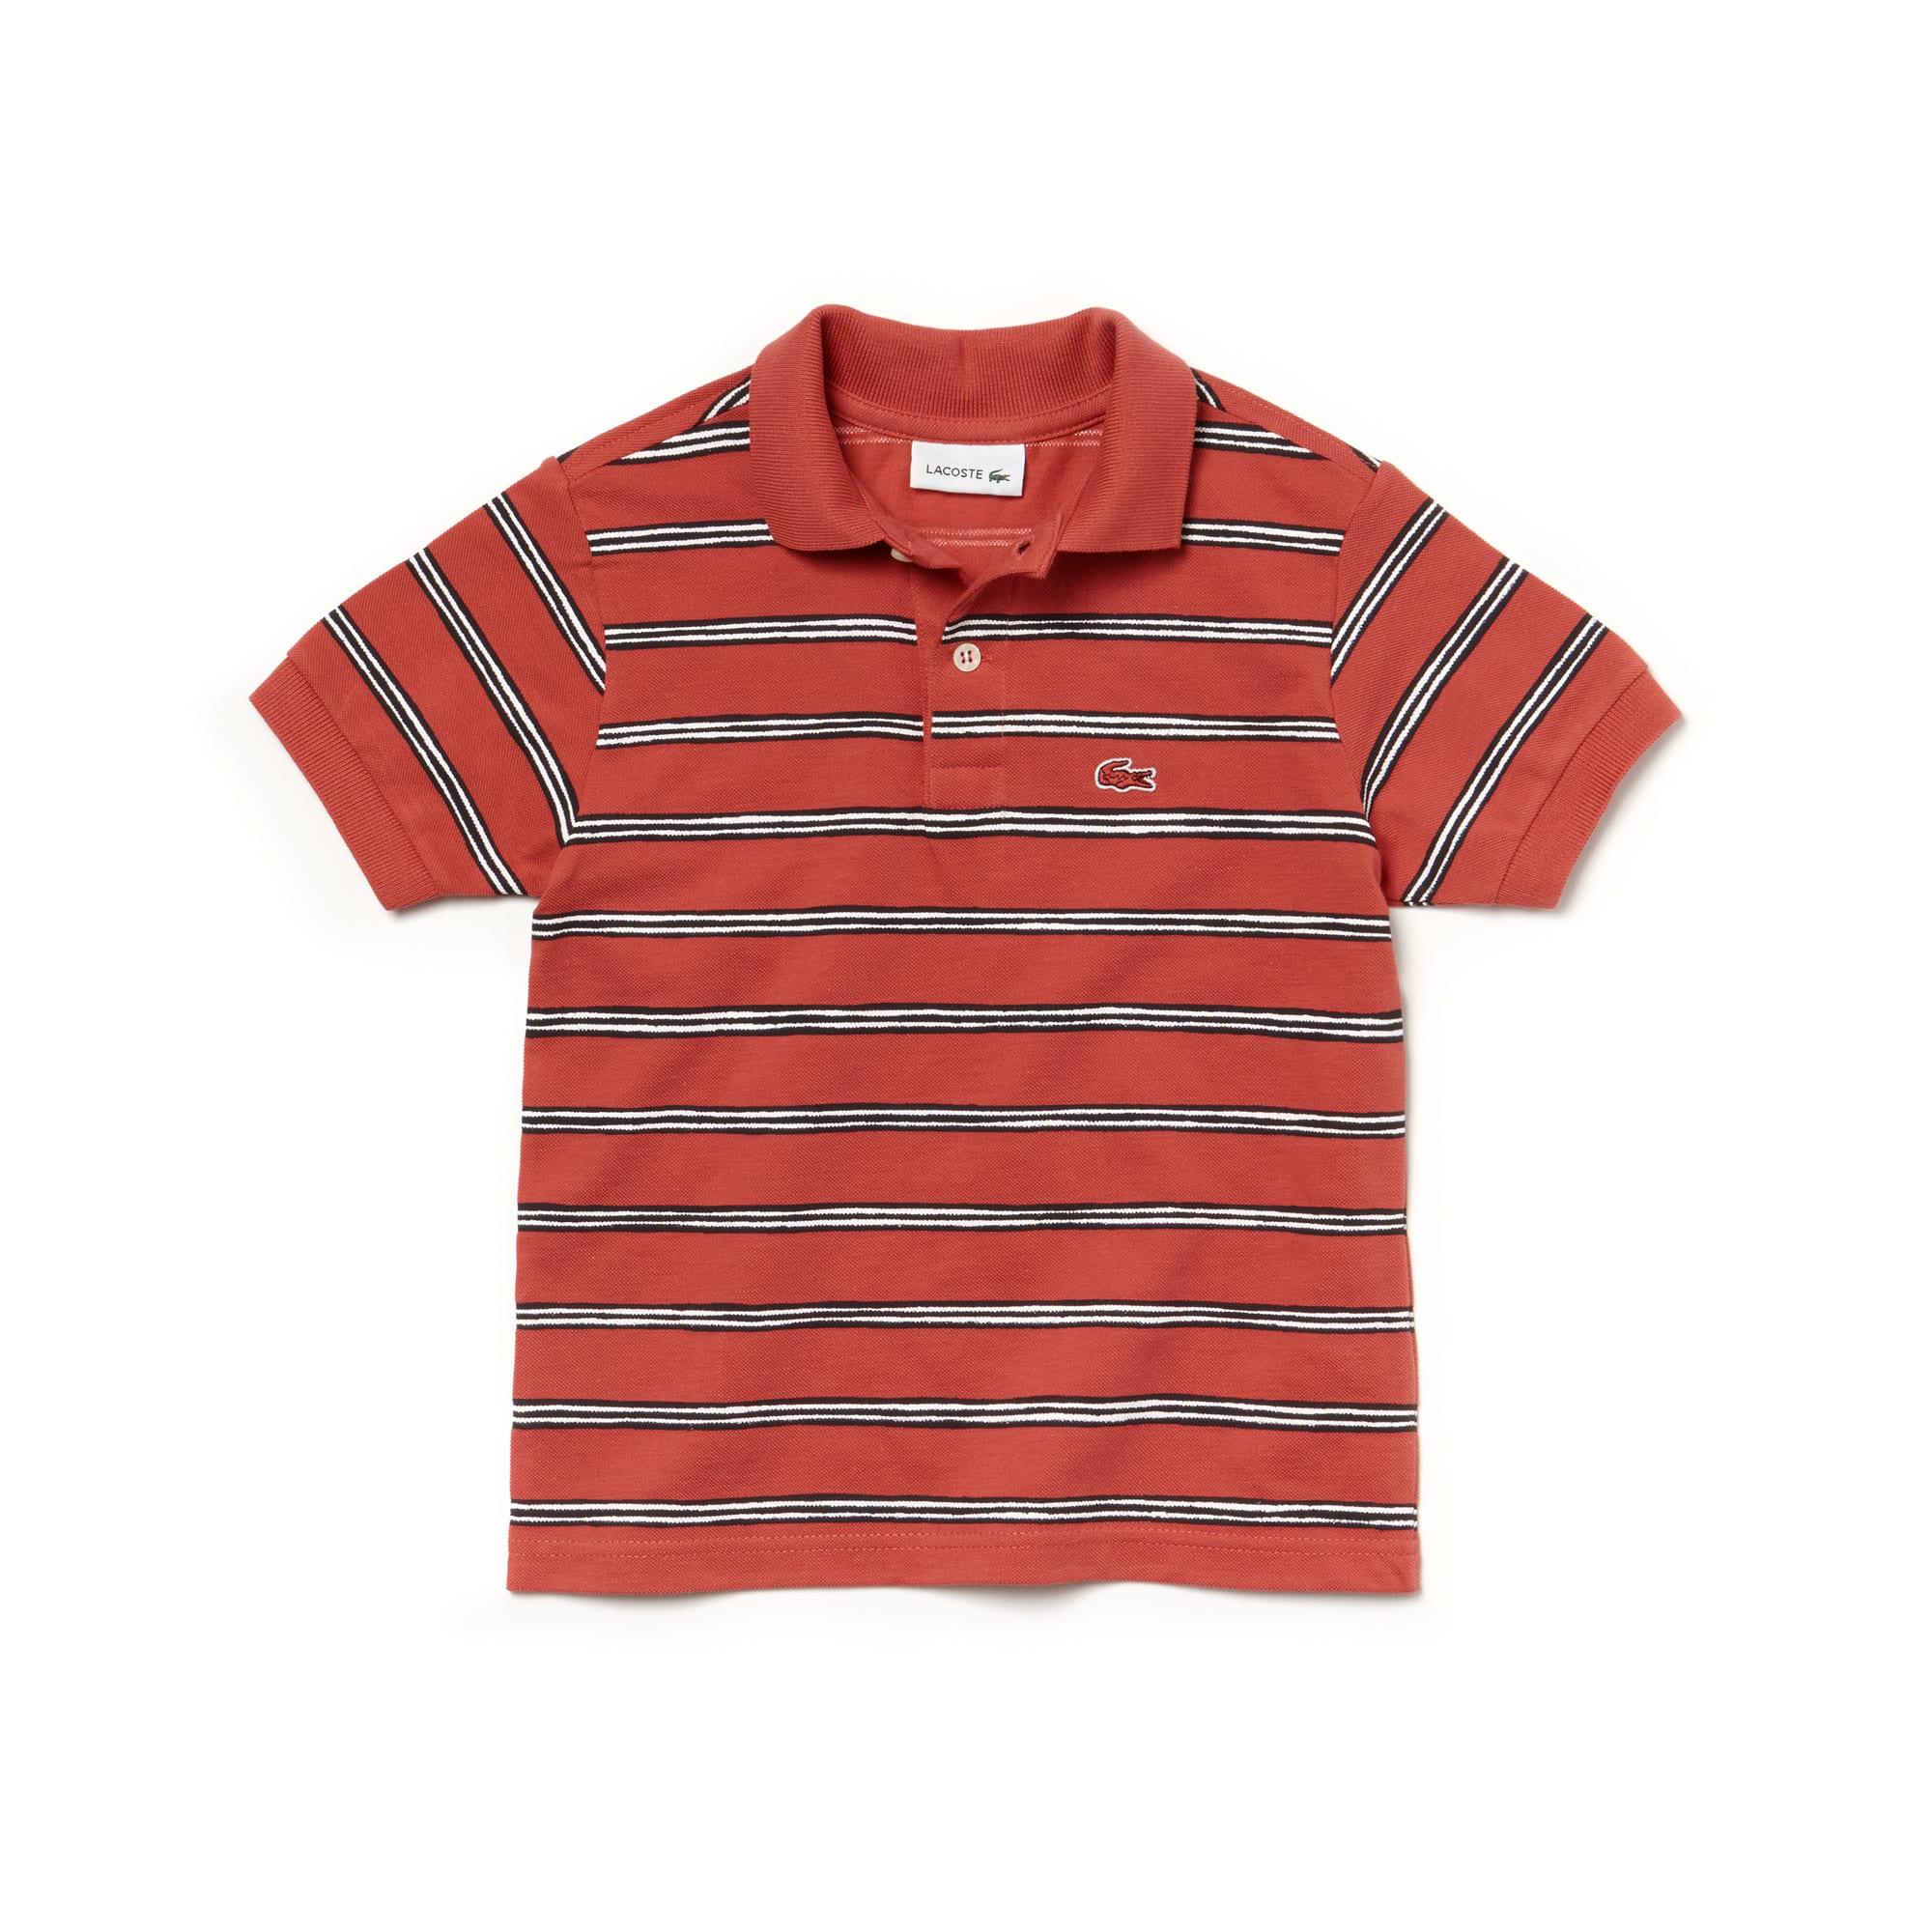 Boys' Lacoste Striped Cotton Mini Piqué Polo Shirt